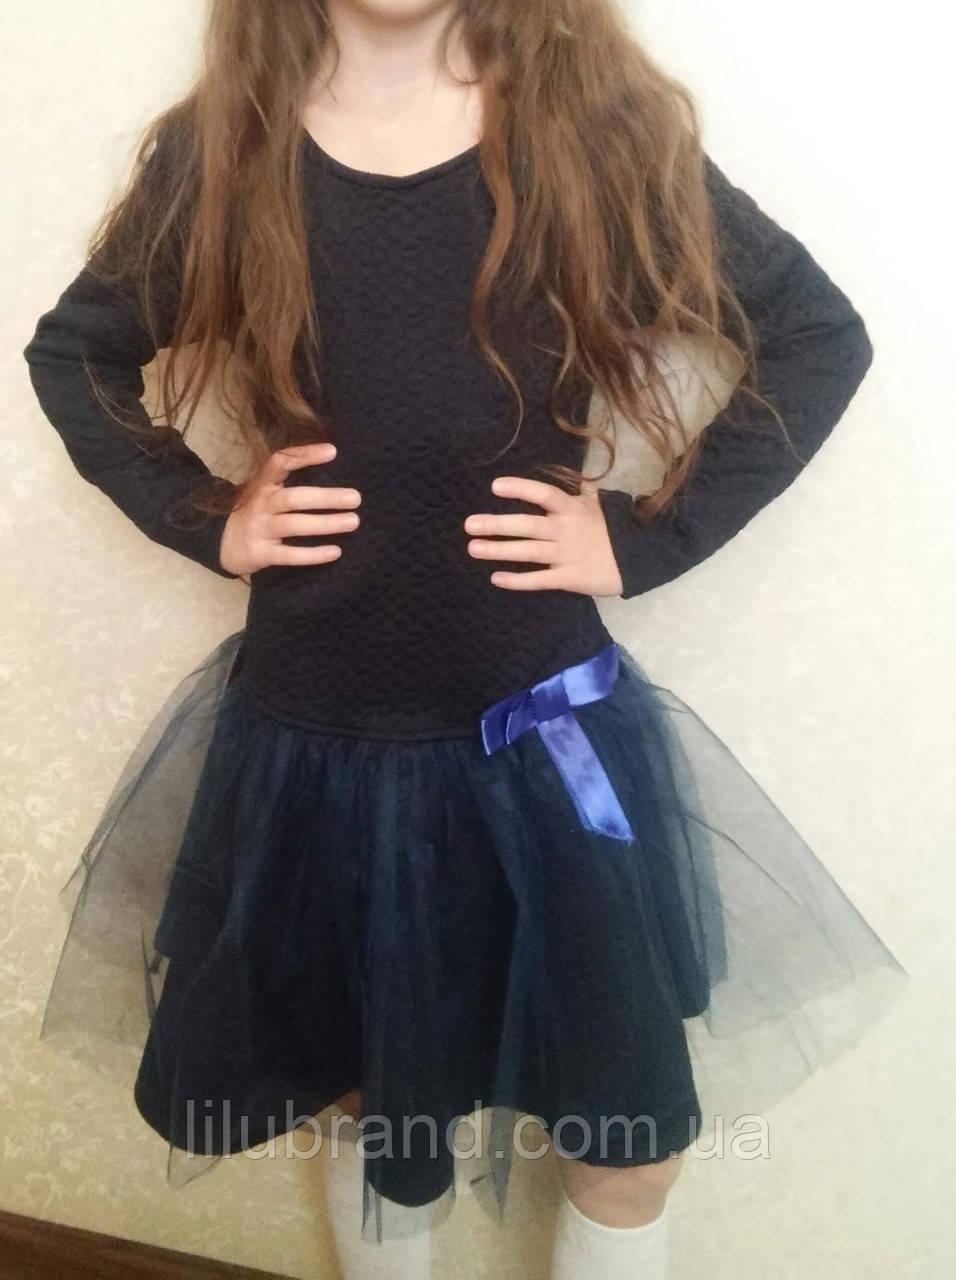 92e2600a41a Нарядное платье на девочку